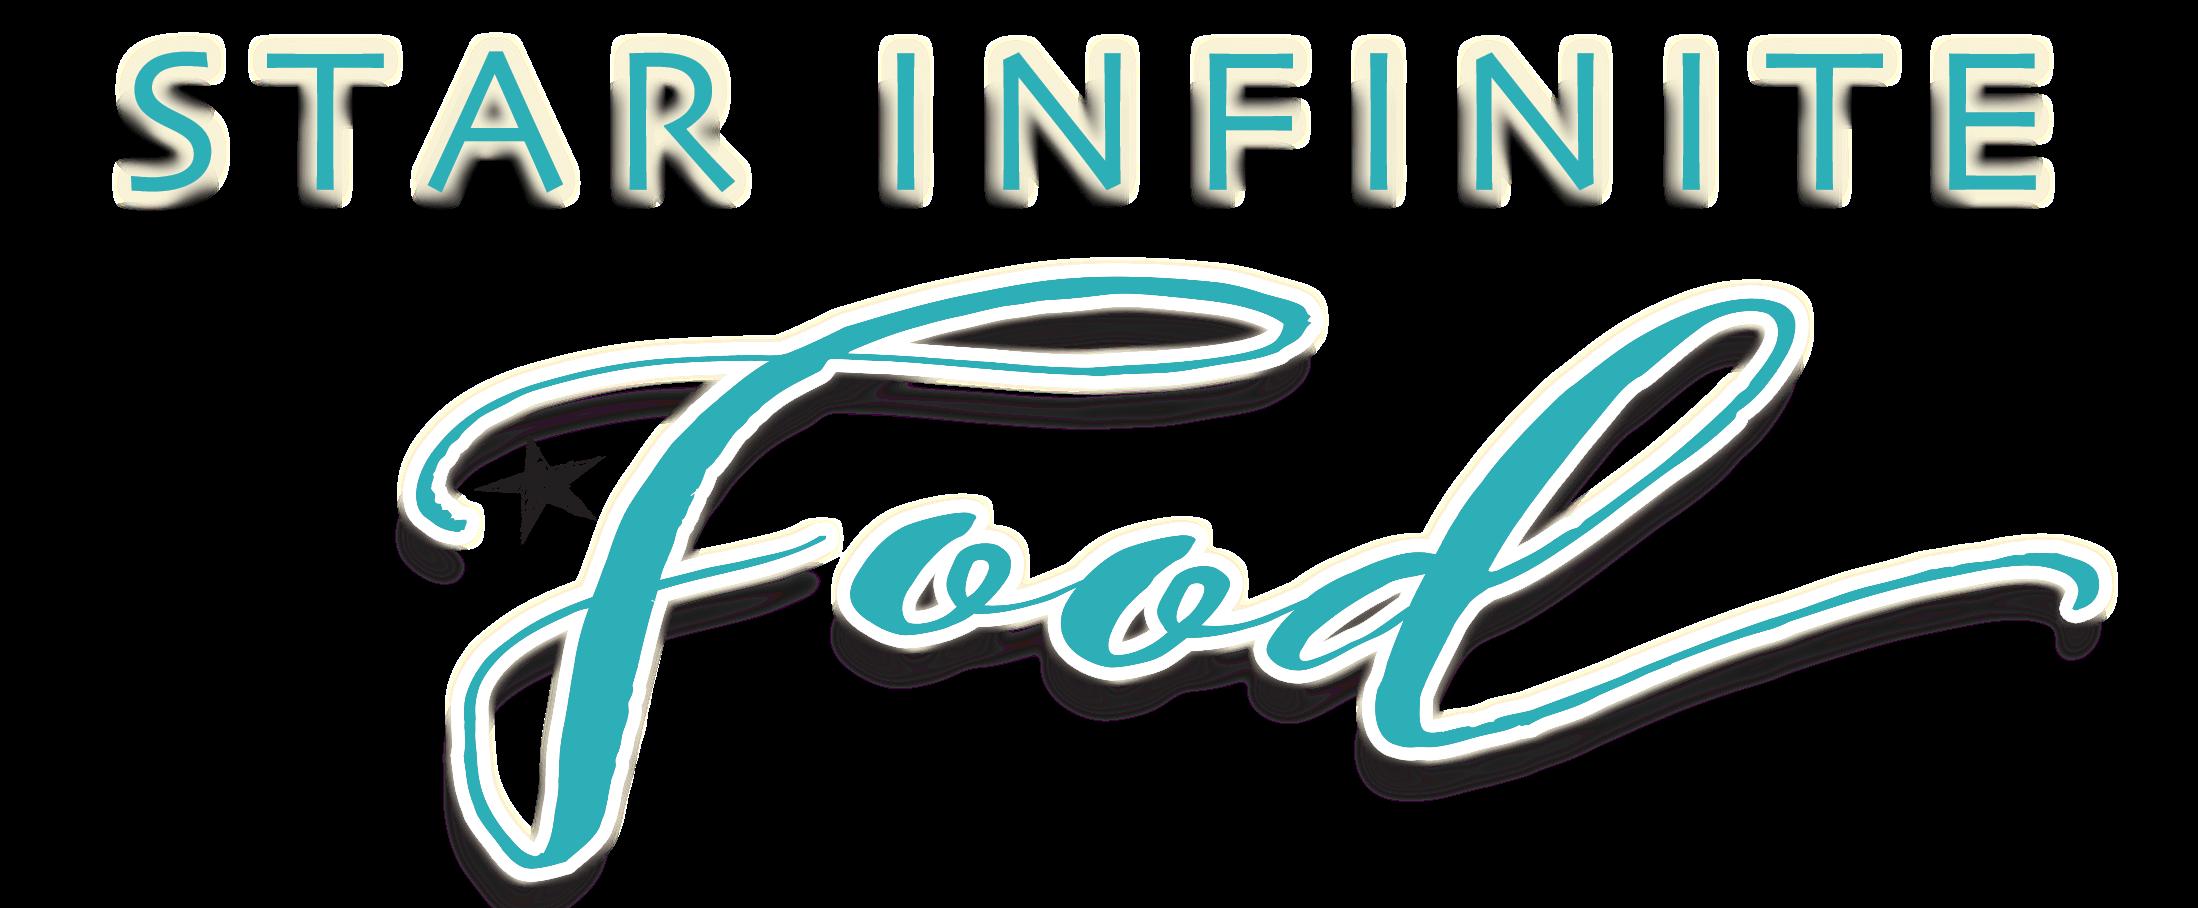 star-infinite-food-logo